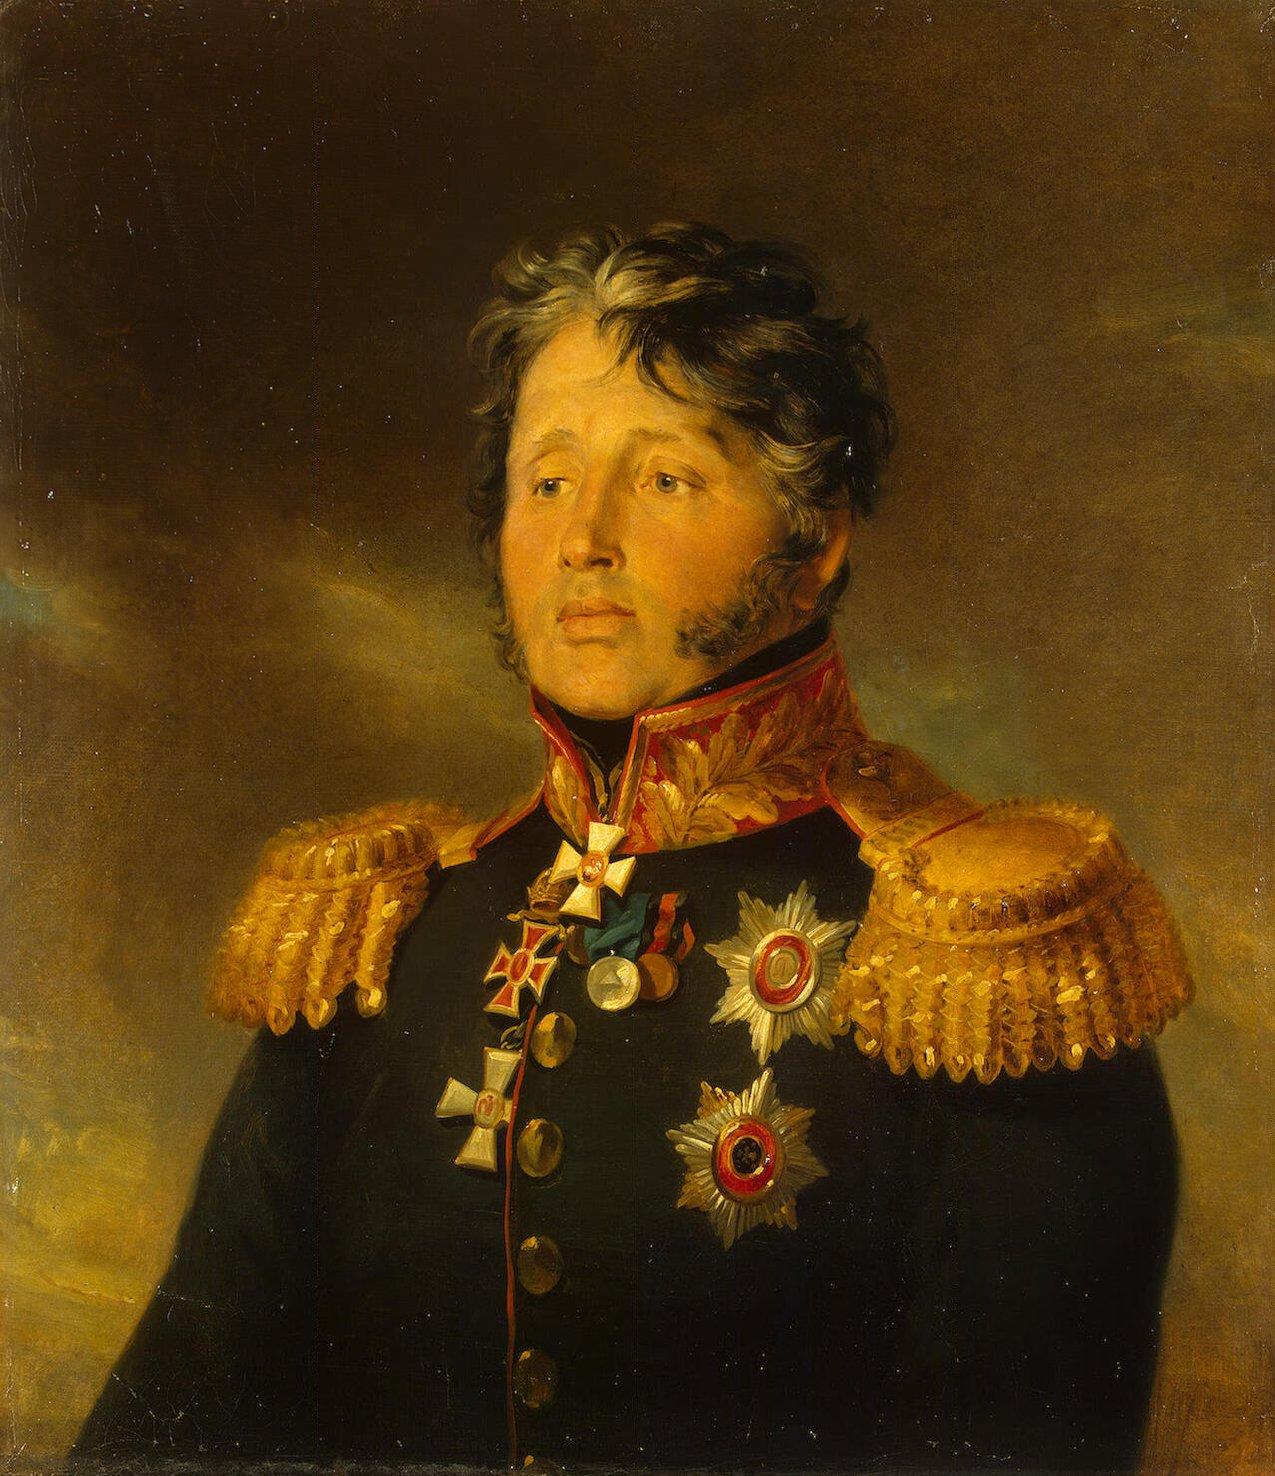 Сабанеев, Иван Васильевич